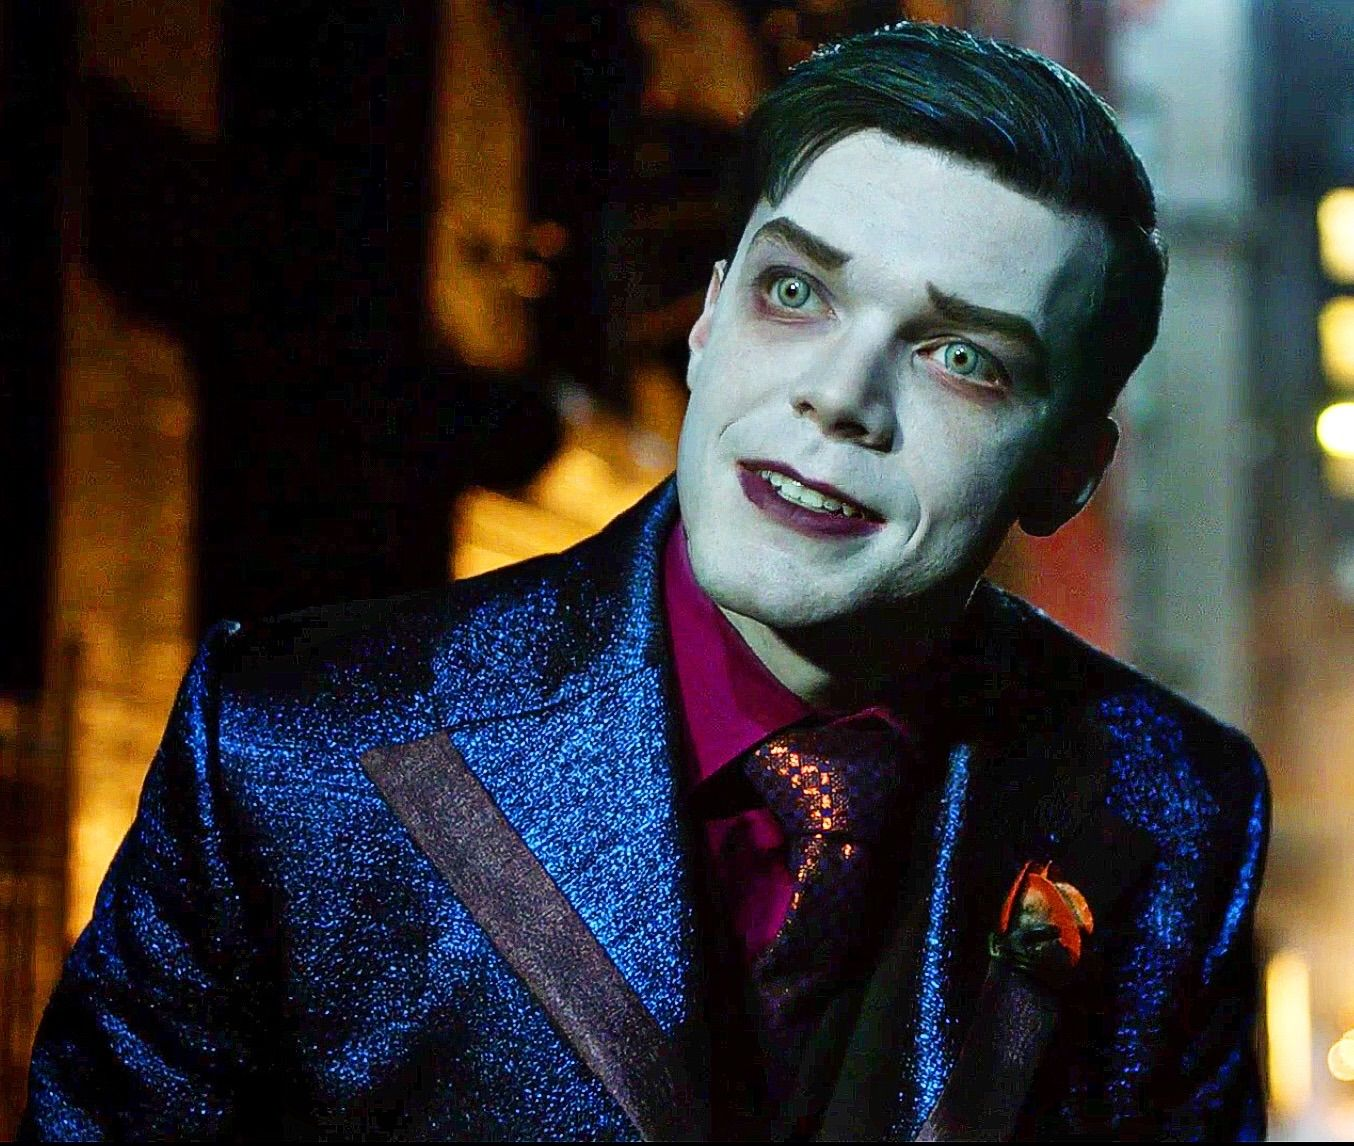 Cameron Monaghan Gotham Jeremiah Valeska Gotham Joker Cameron Monaghan Gotham Tv Series Ксандер уайлд mister j возраст: pinterest